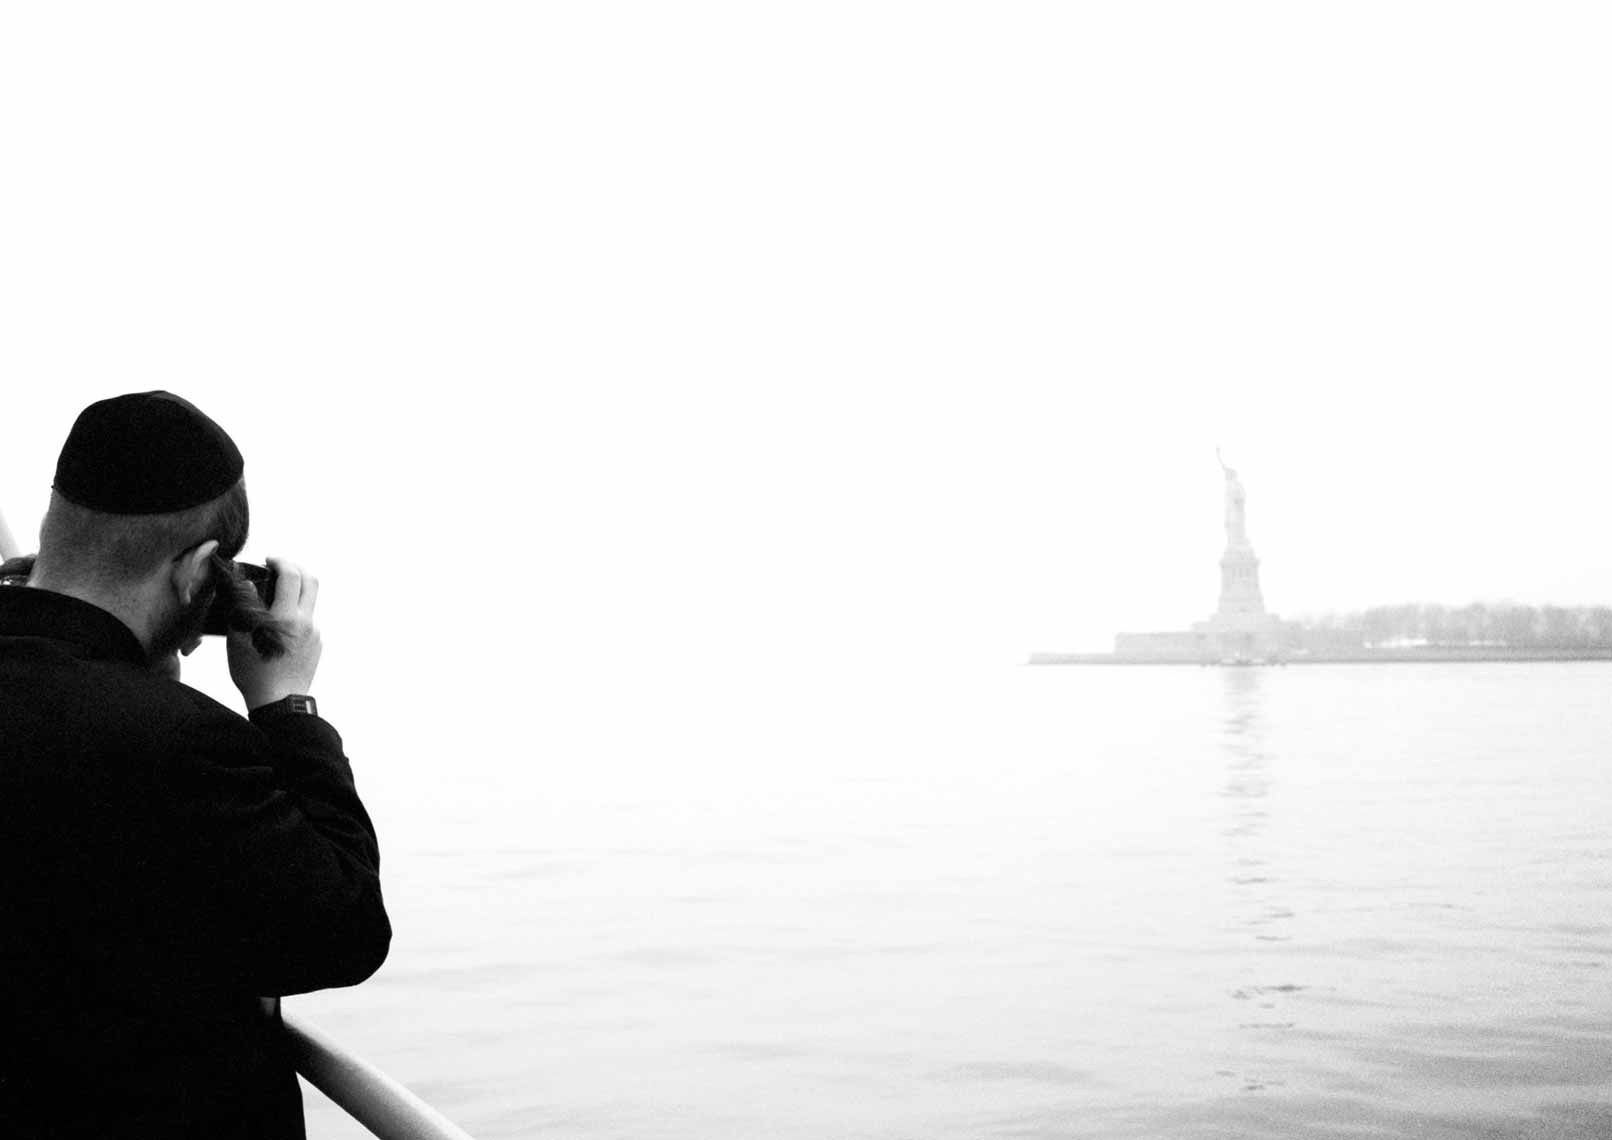 fotografie-rotterdam-fotograaf-pim-vuik-new-york-28.jpg